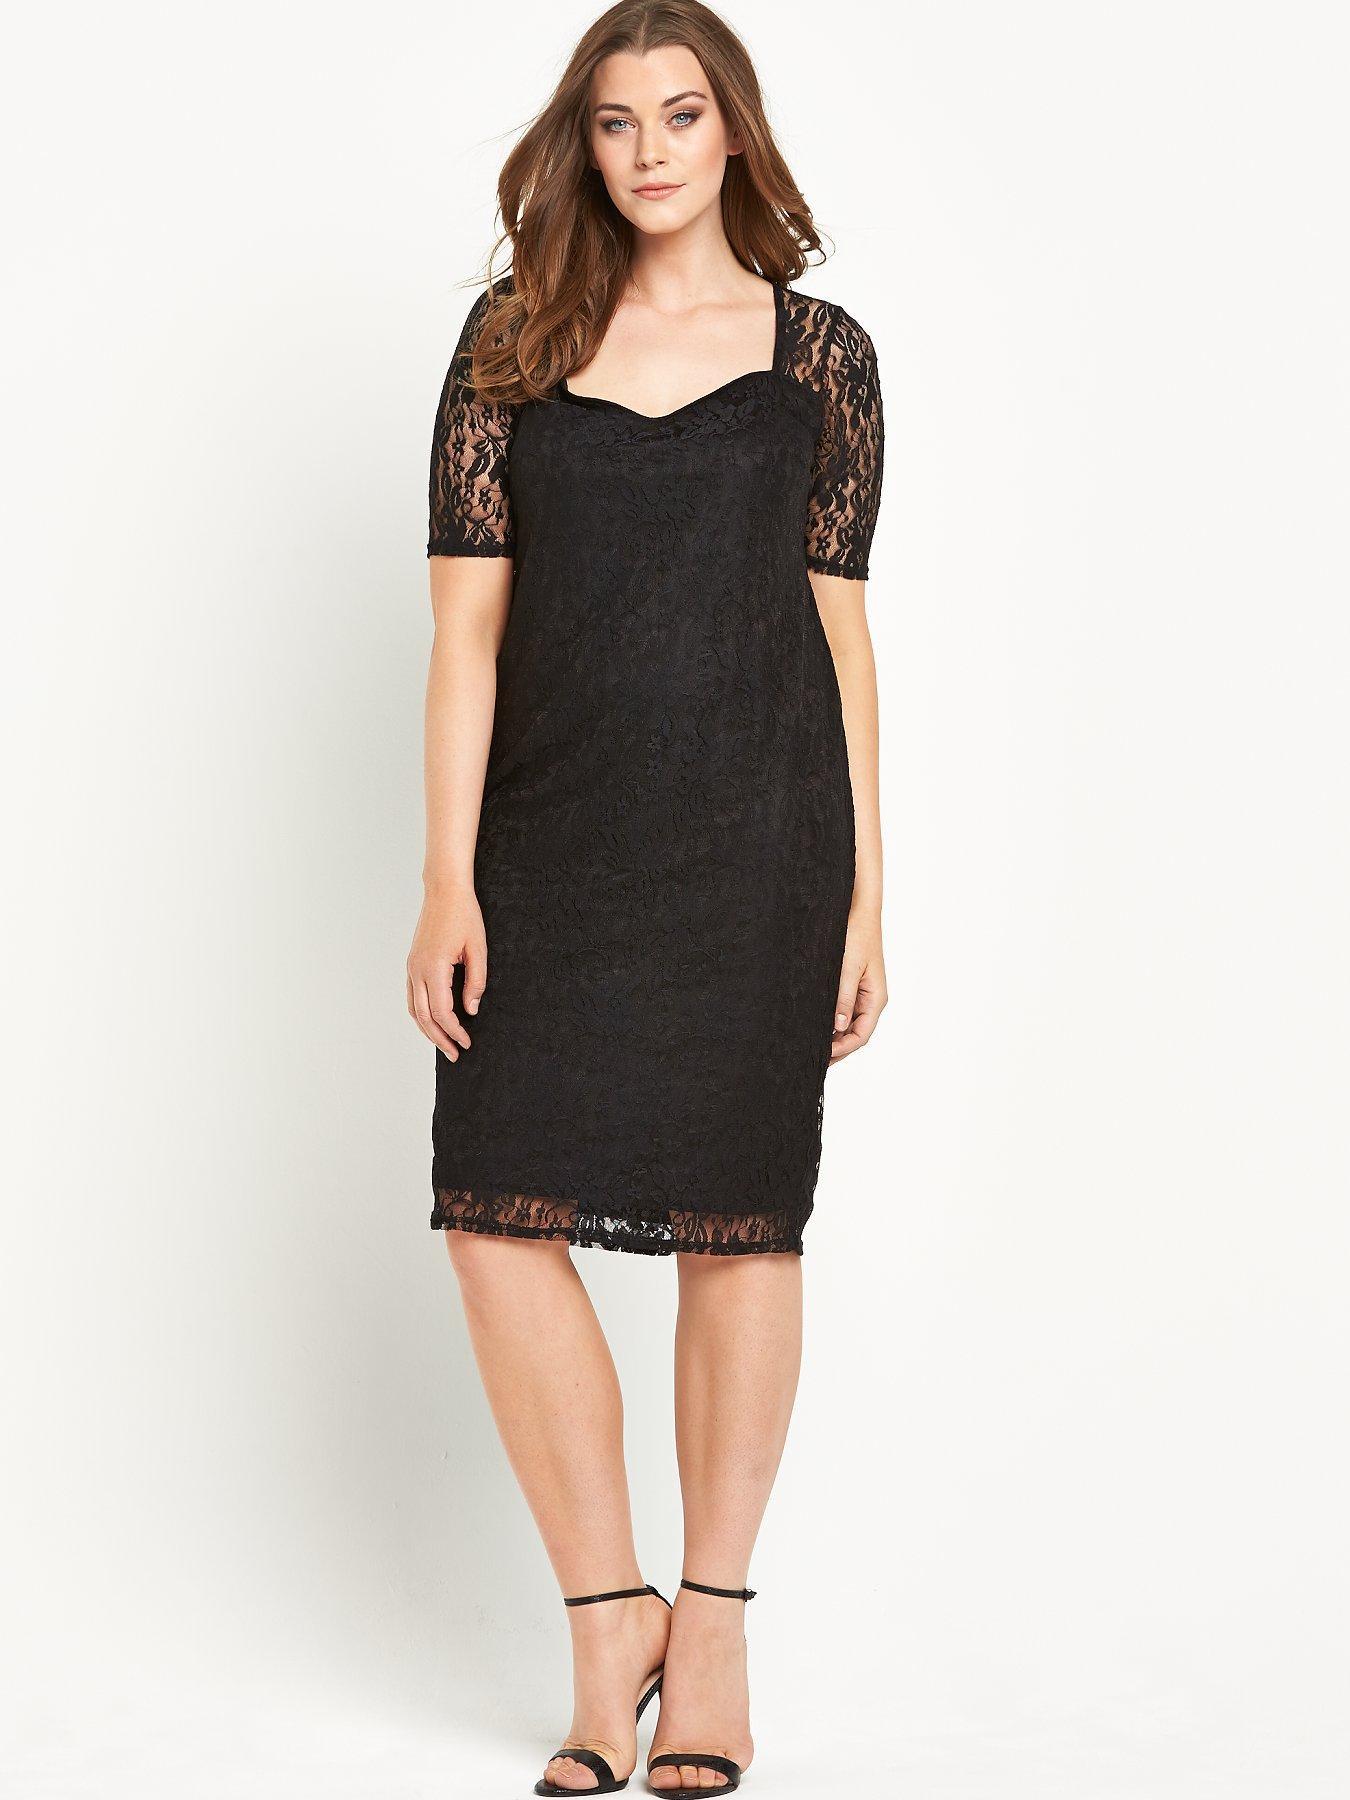 Little Black Dress Ireland